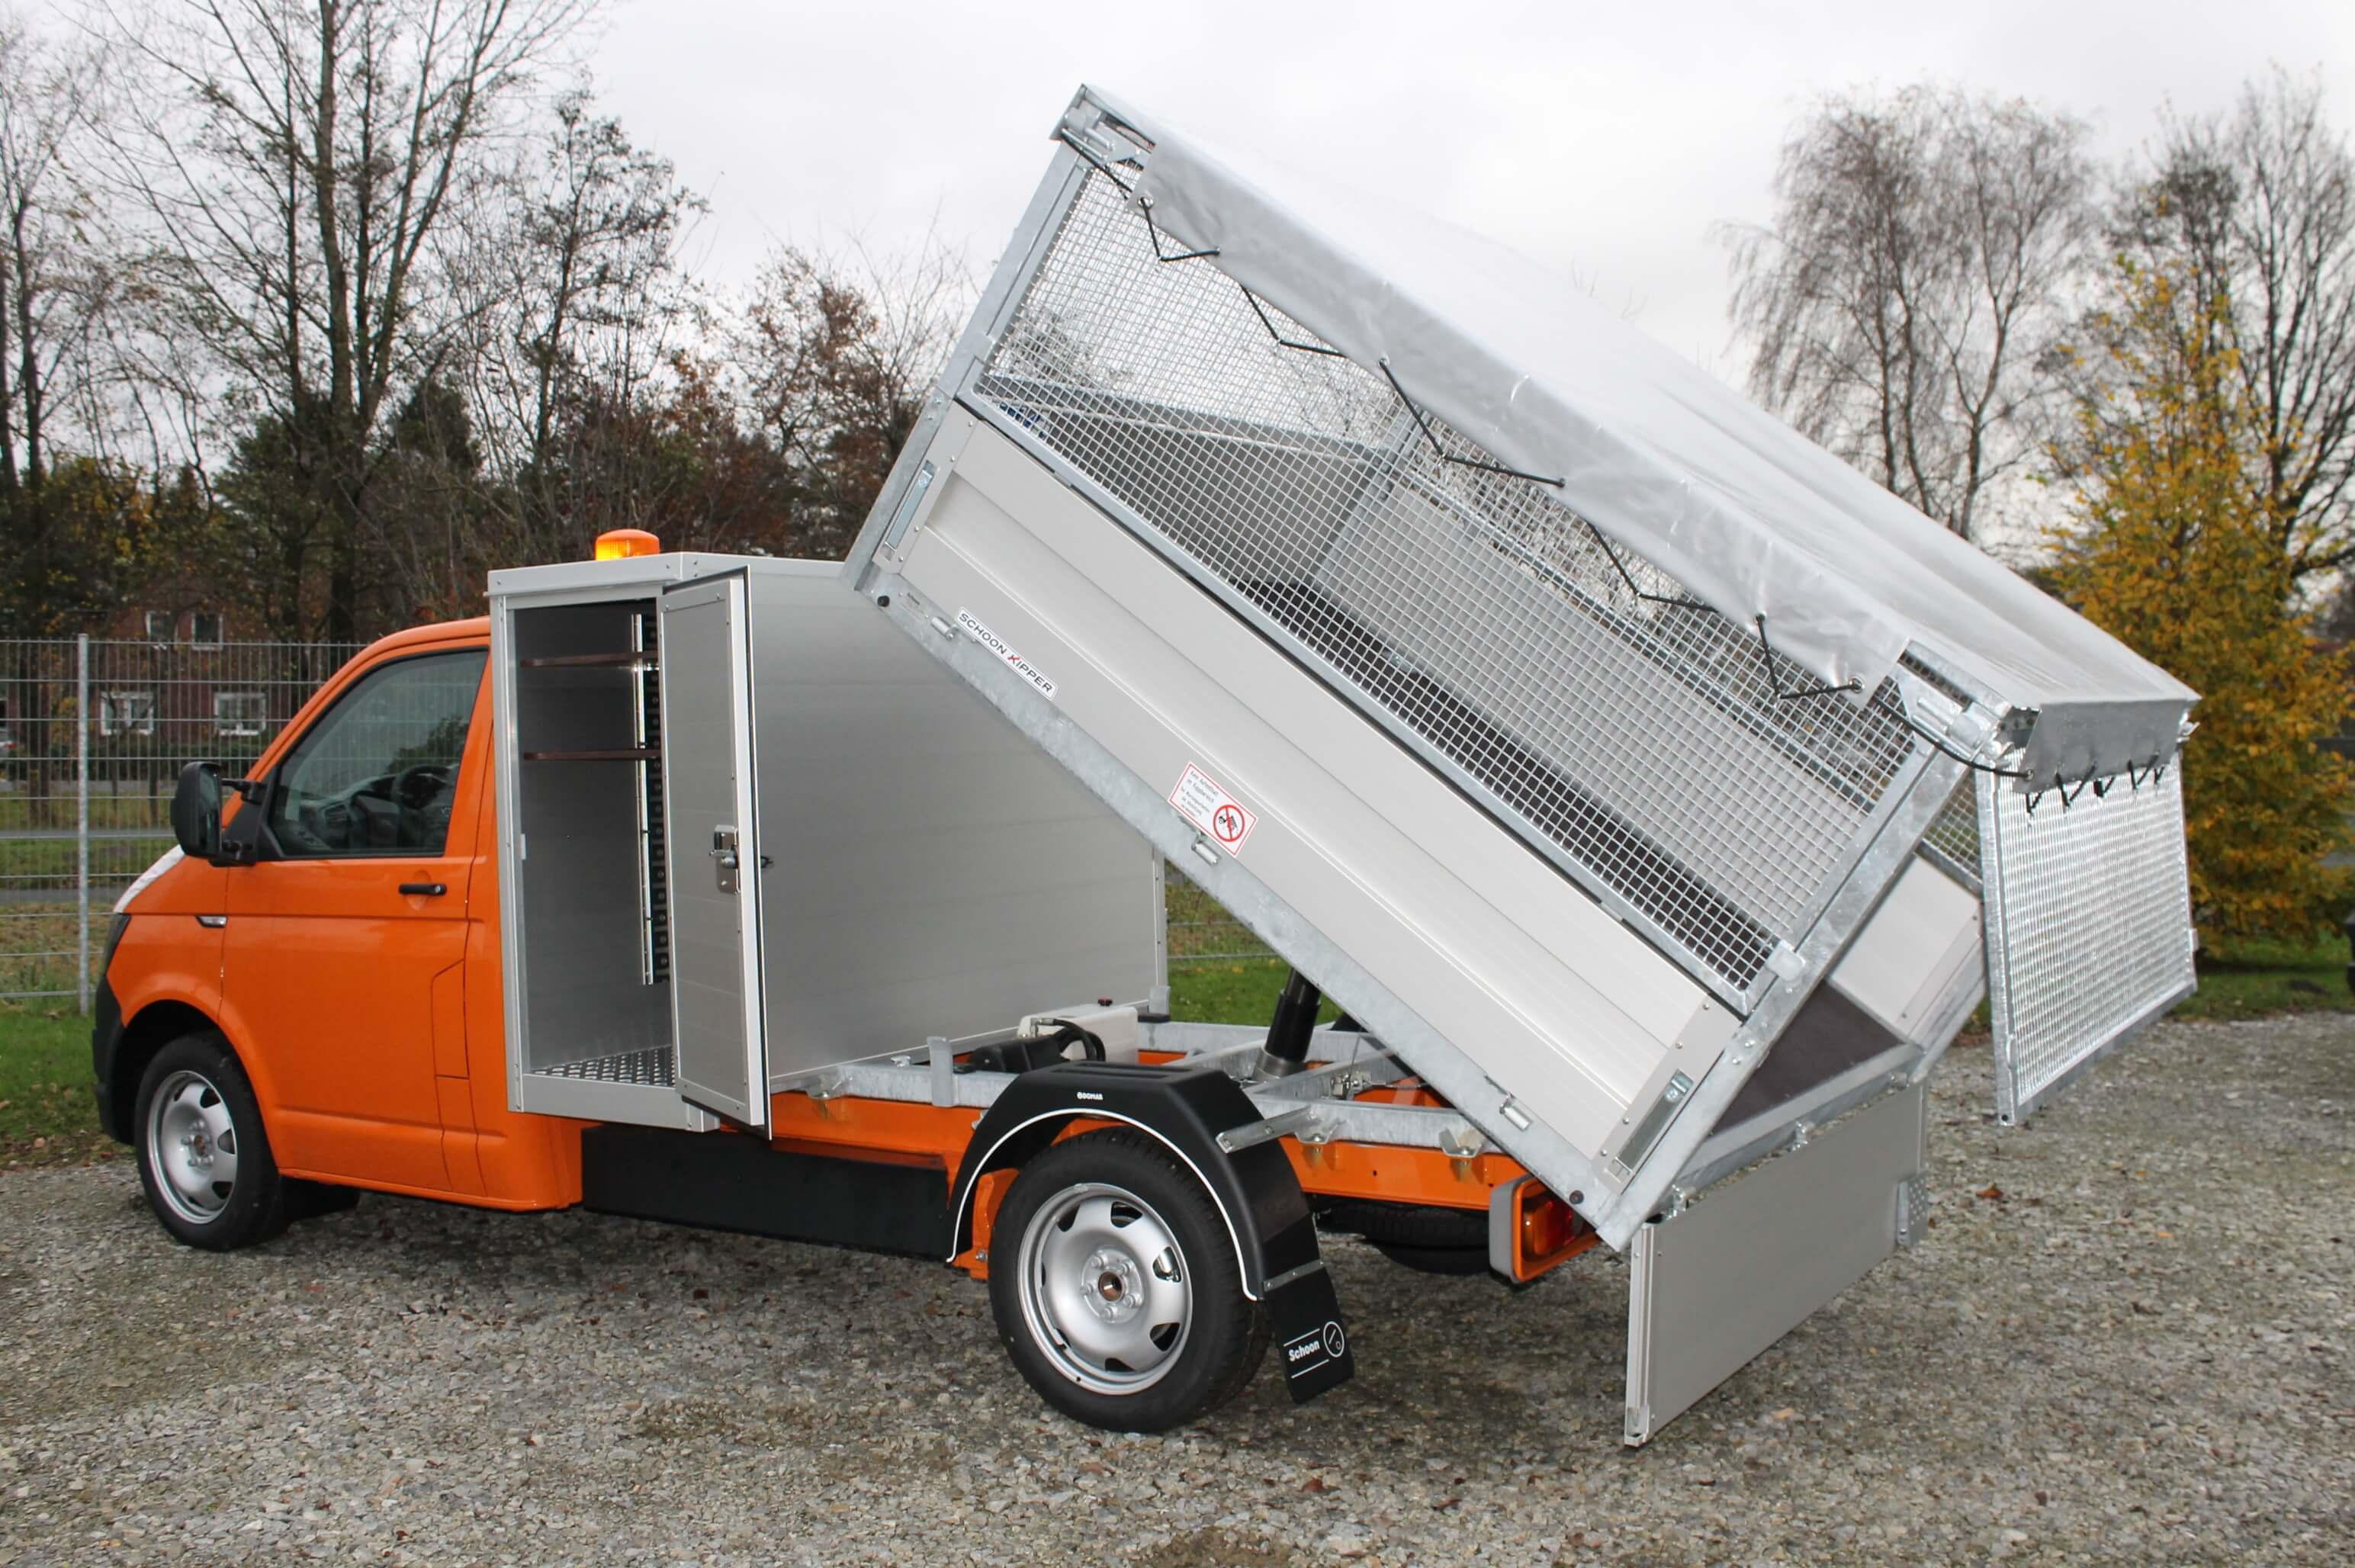 volkswagen transporter schoon fahrzeugsysteme. Black Bedroom Furniture Sets. Home Design Ideas